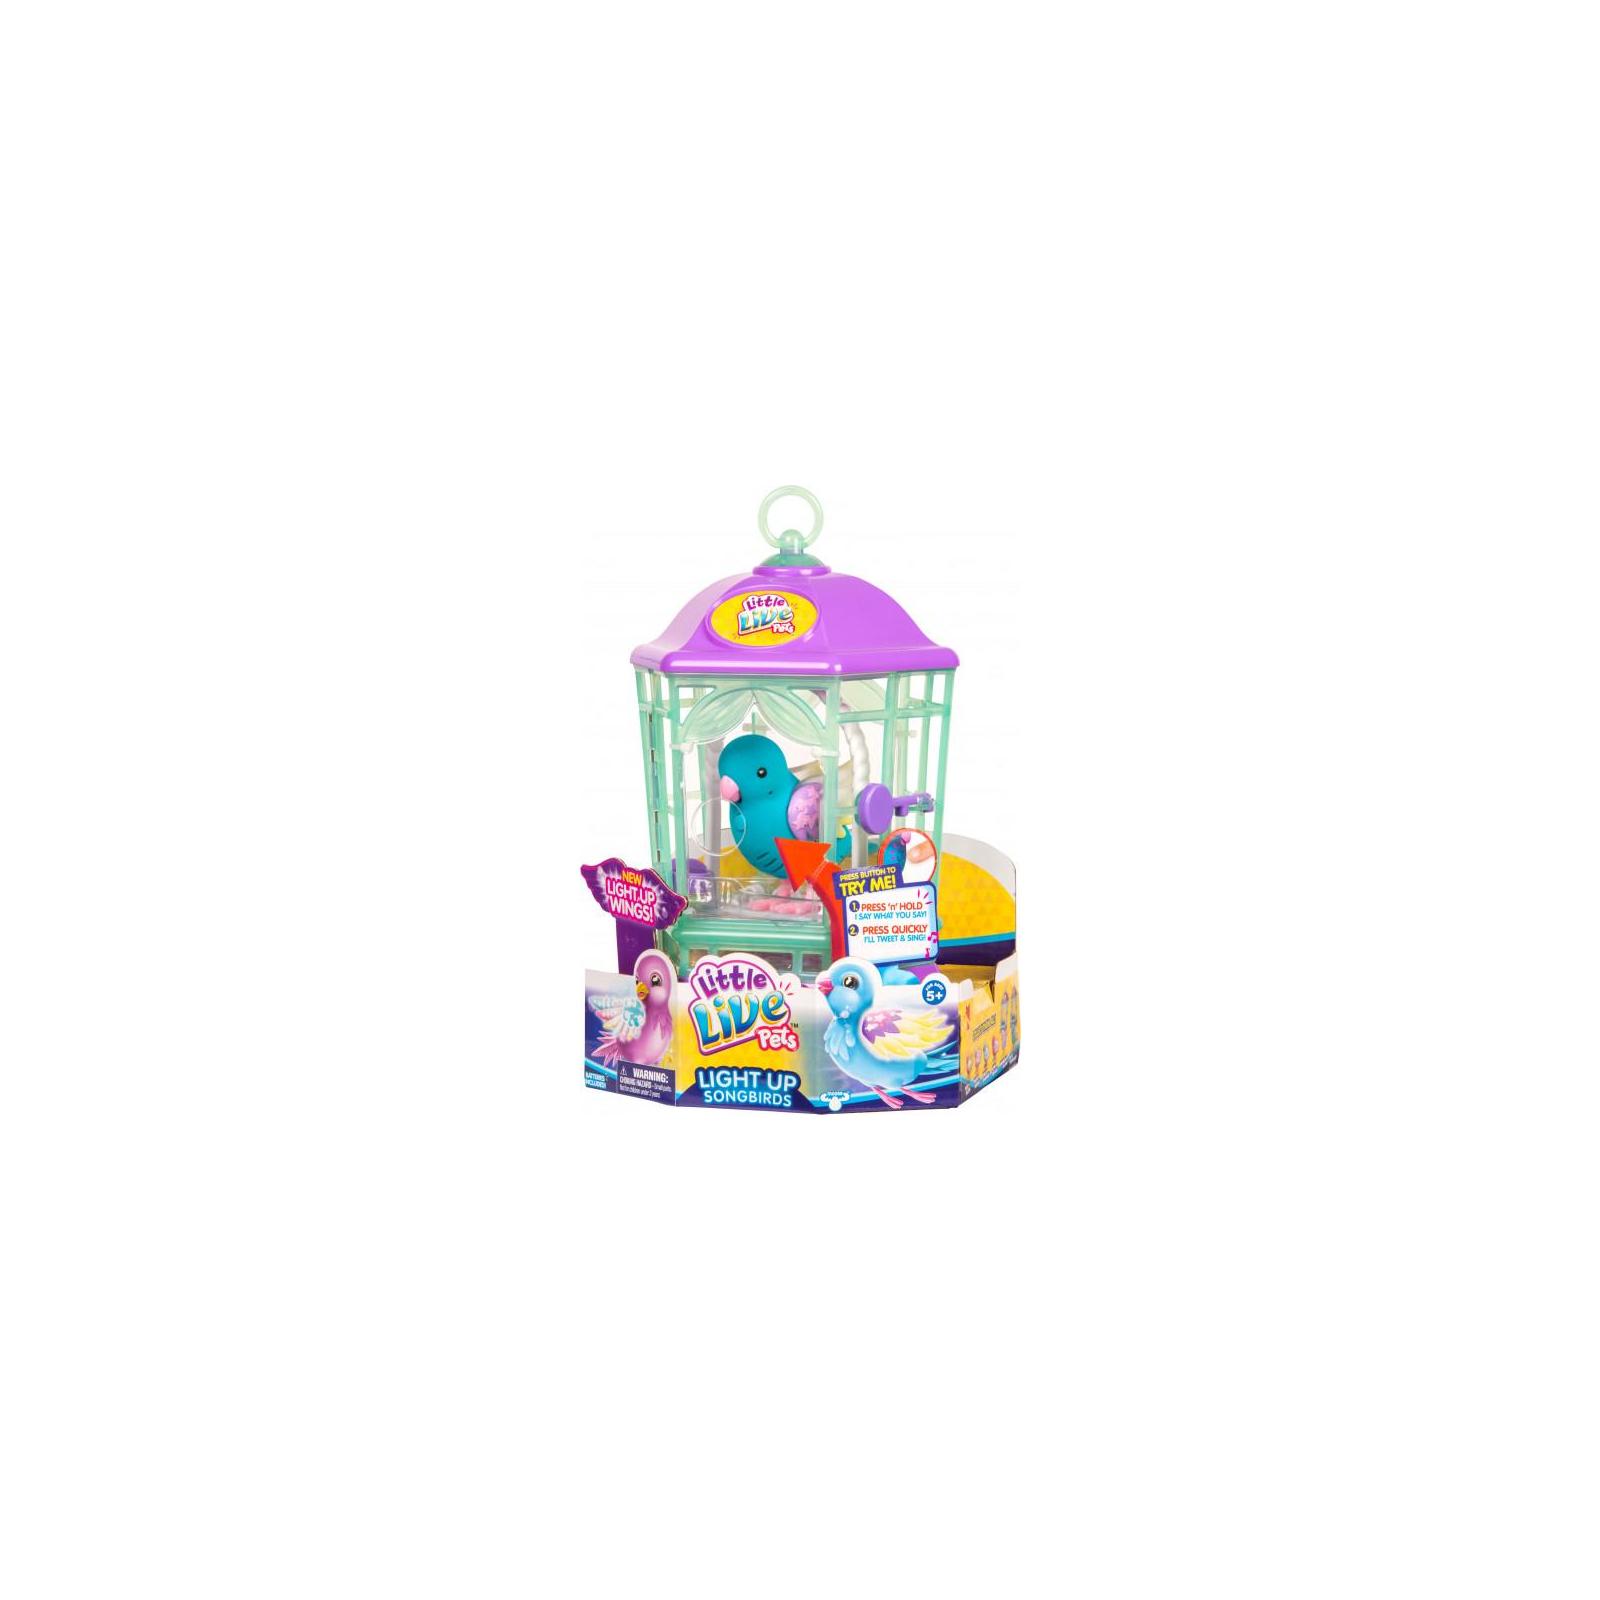 Интерактивная игрушка Moose Птичка в клетке Little Live Pets Skye Twinkles (28548) изображение 5